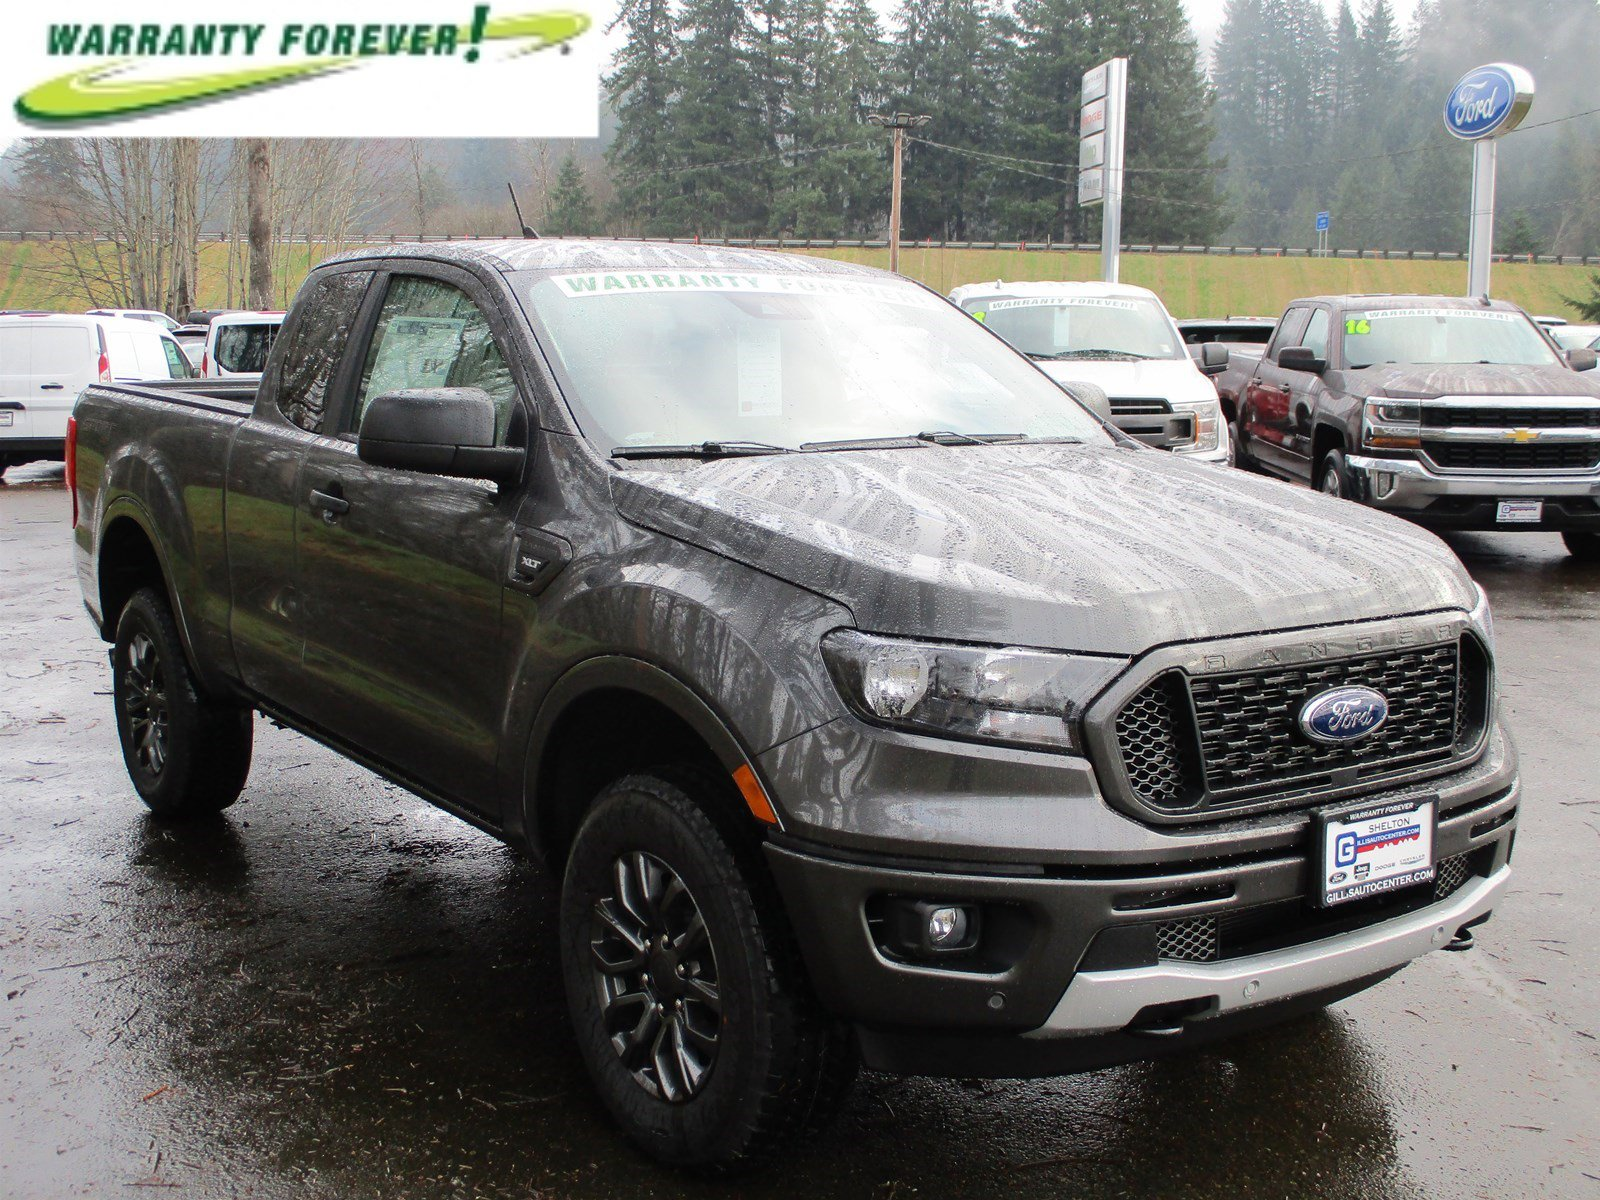 New-2019-Ford-Ranger-XLT-4WD-SuperCab-6'-Box